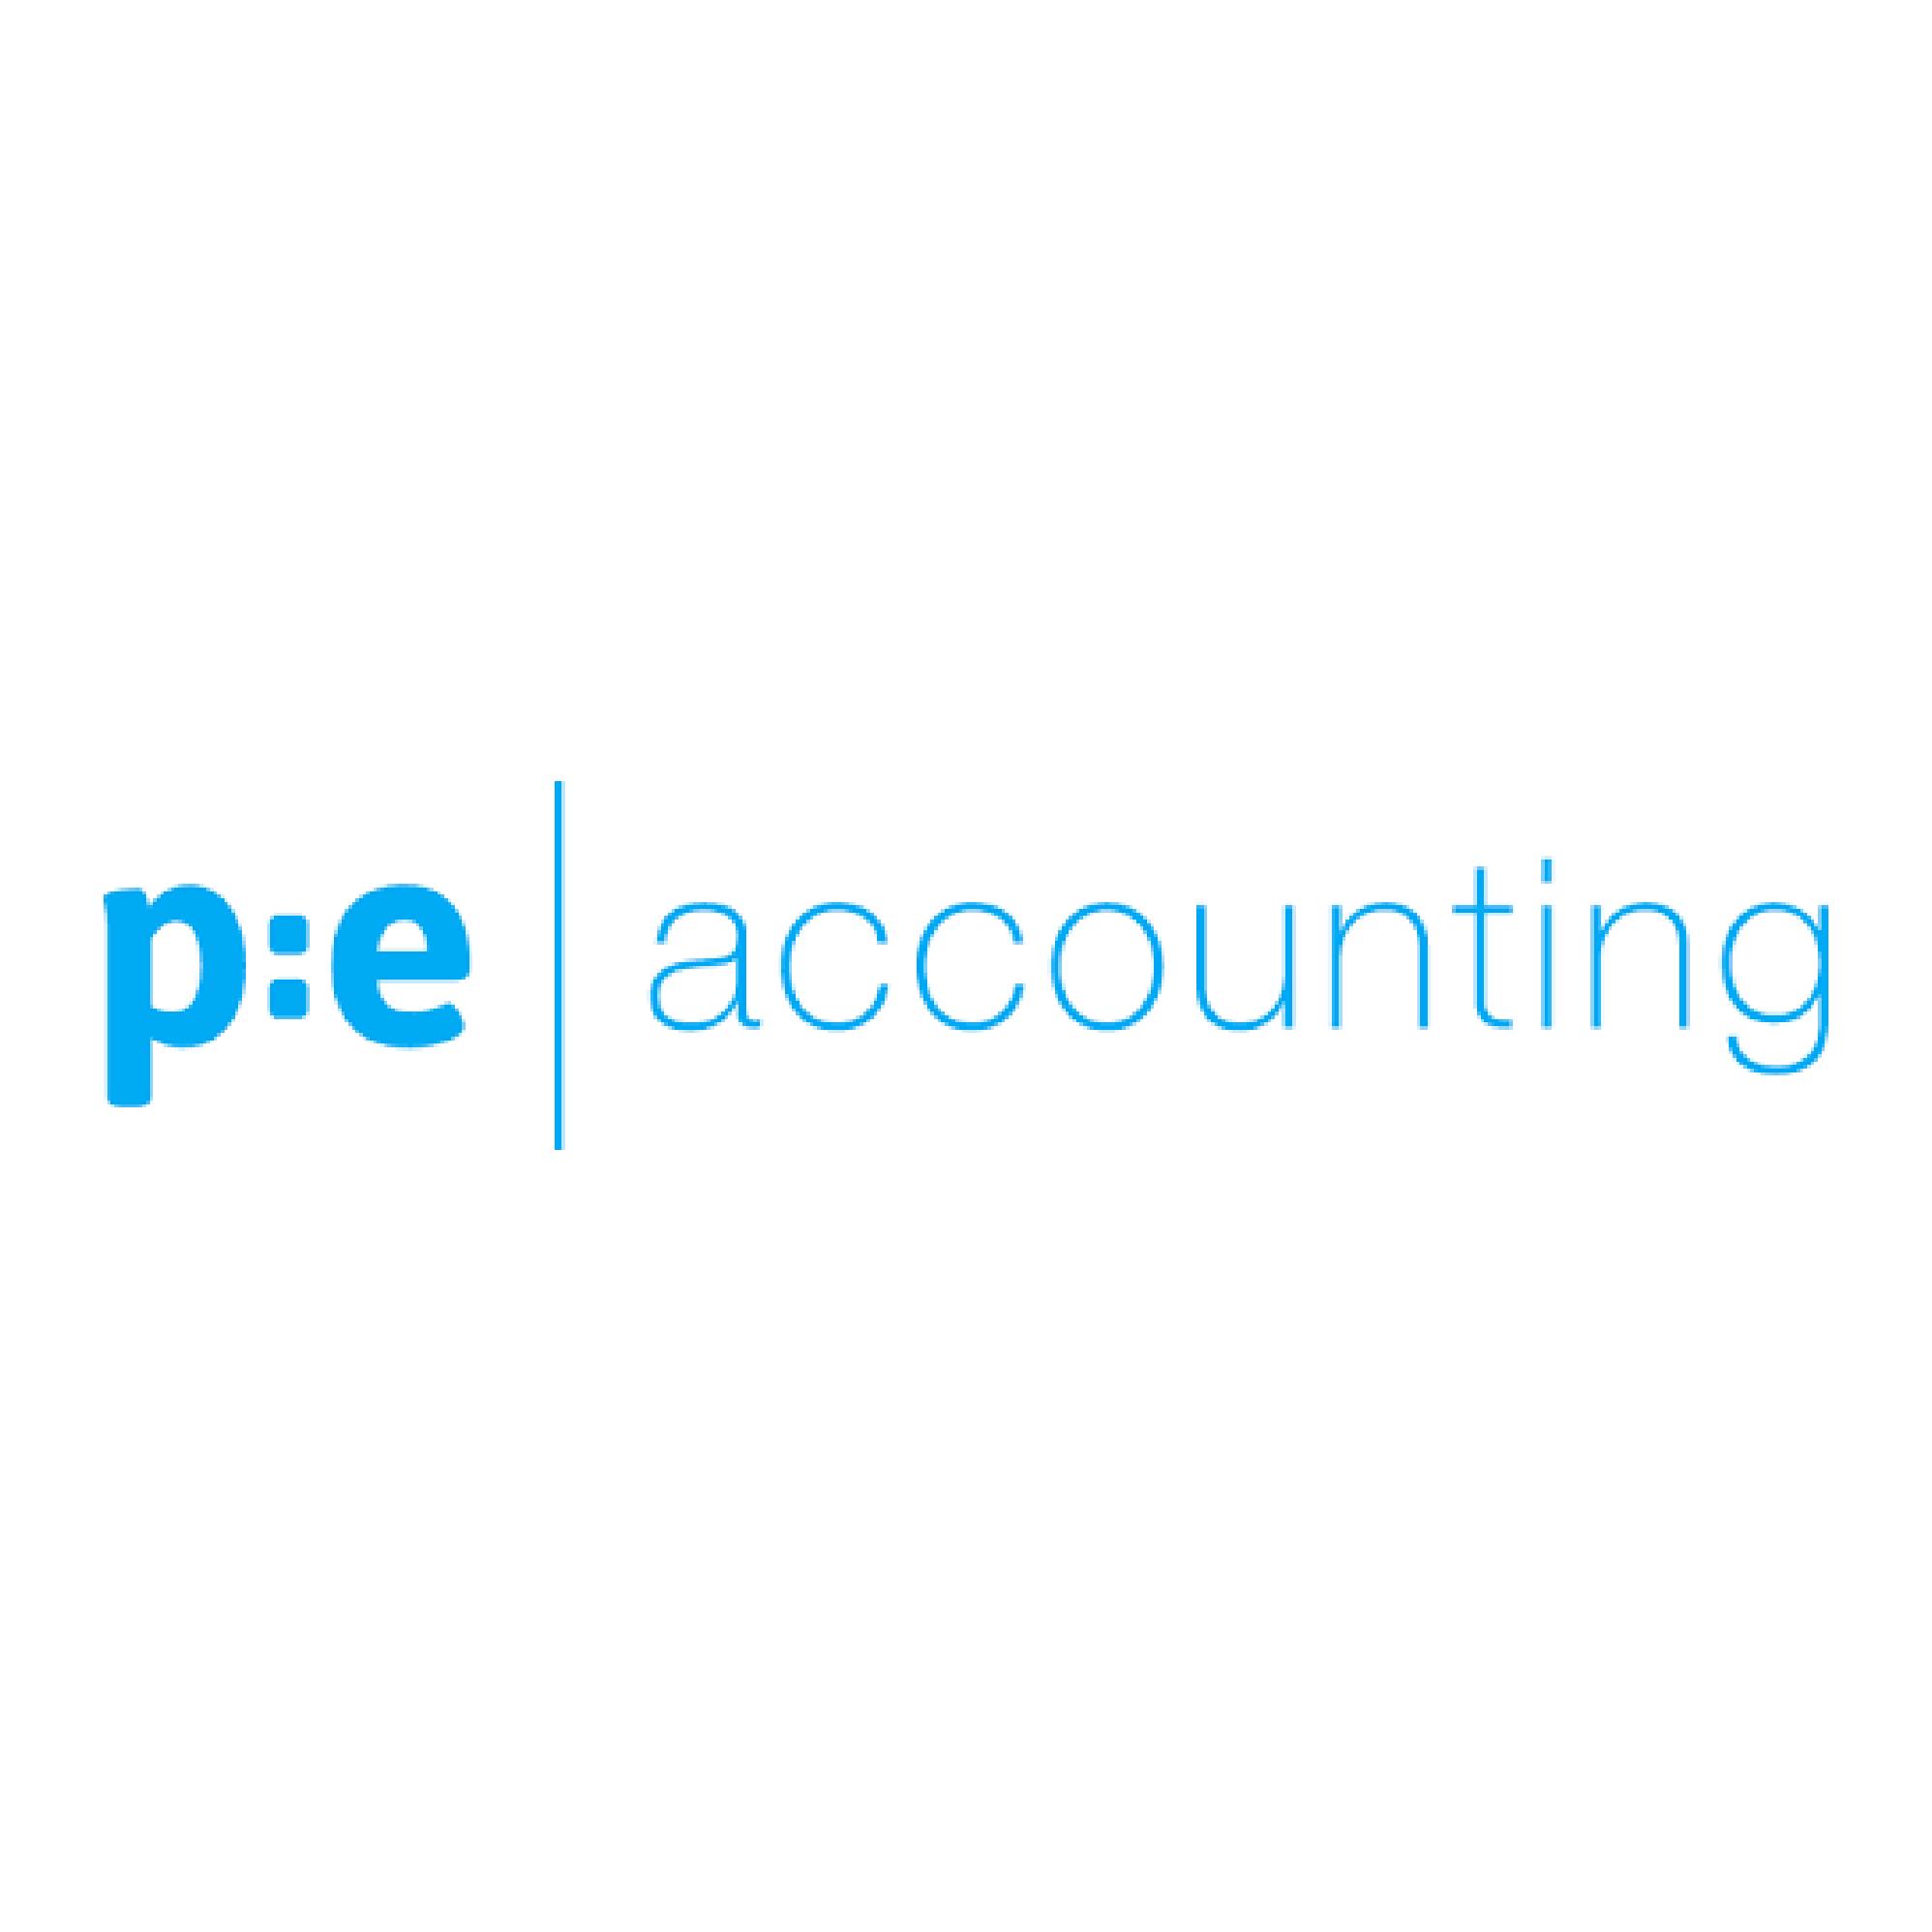 PE Accounting logotyp